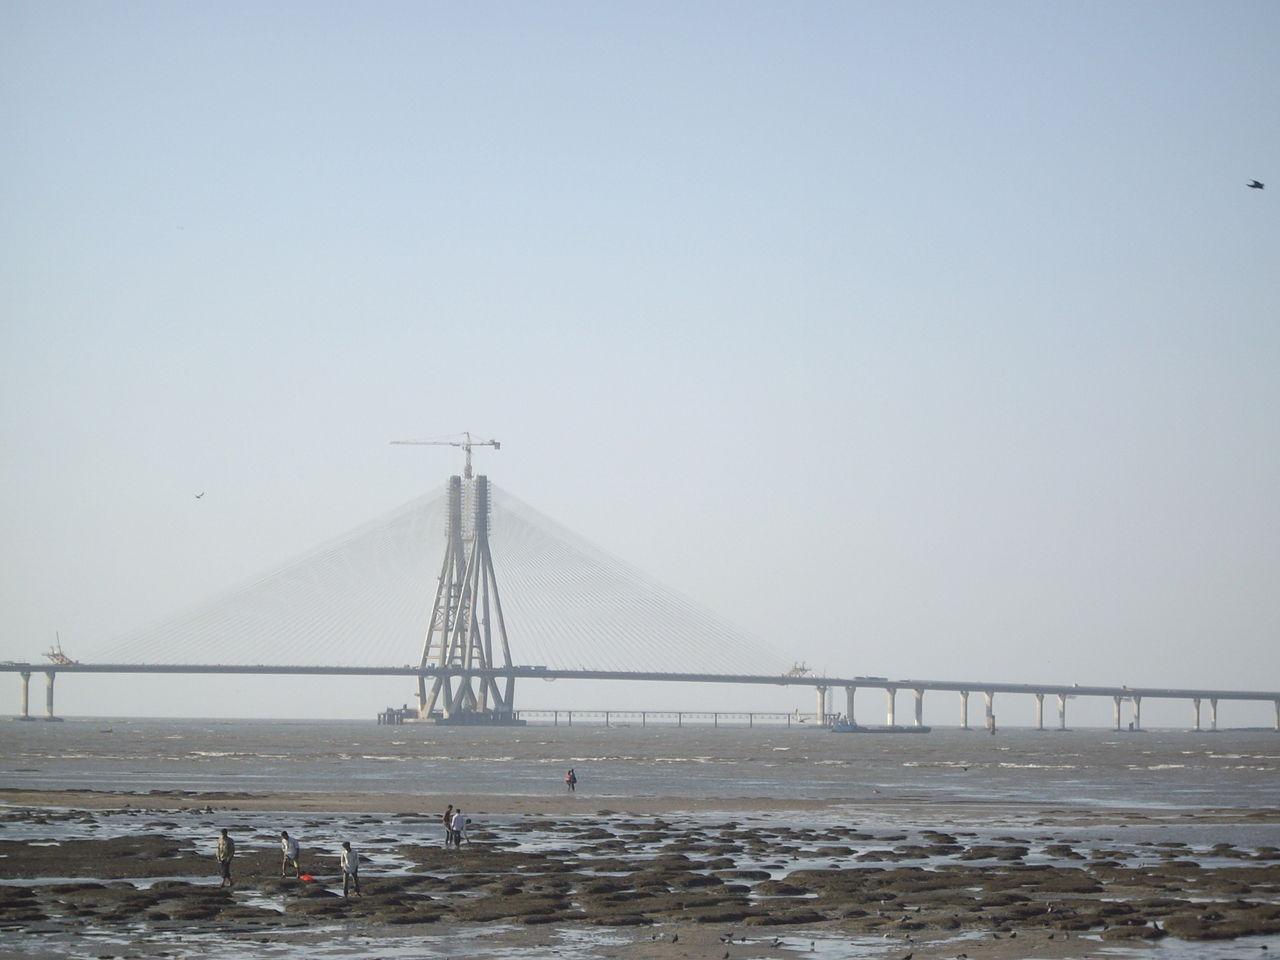 File Bandra Worli Link Bridge As Seen From Dadar Chowpatty Beach Near Kirti M Doongursee College Wednesday 11 2 2009 Jpg